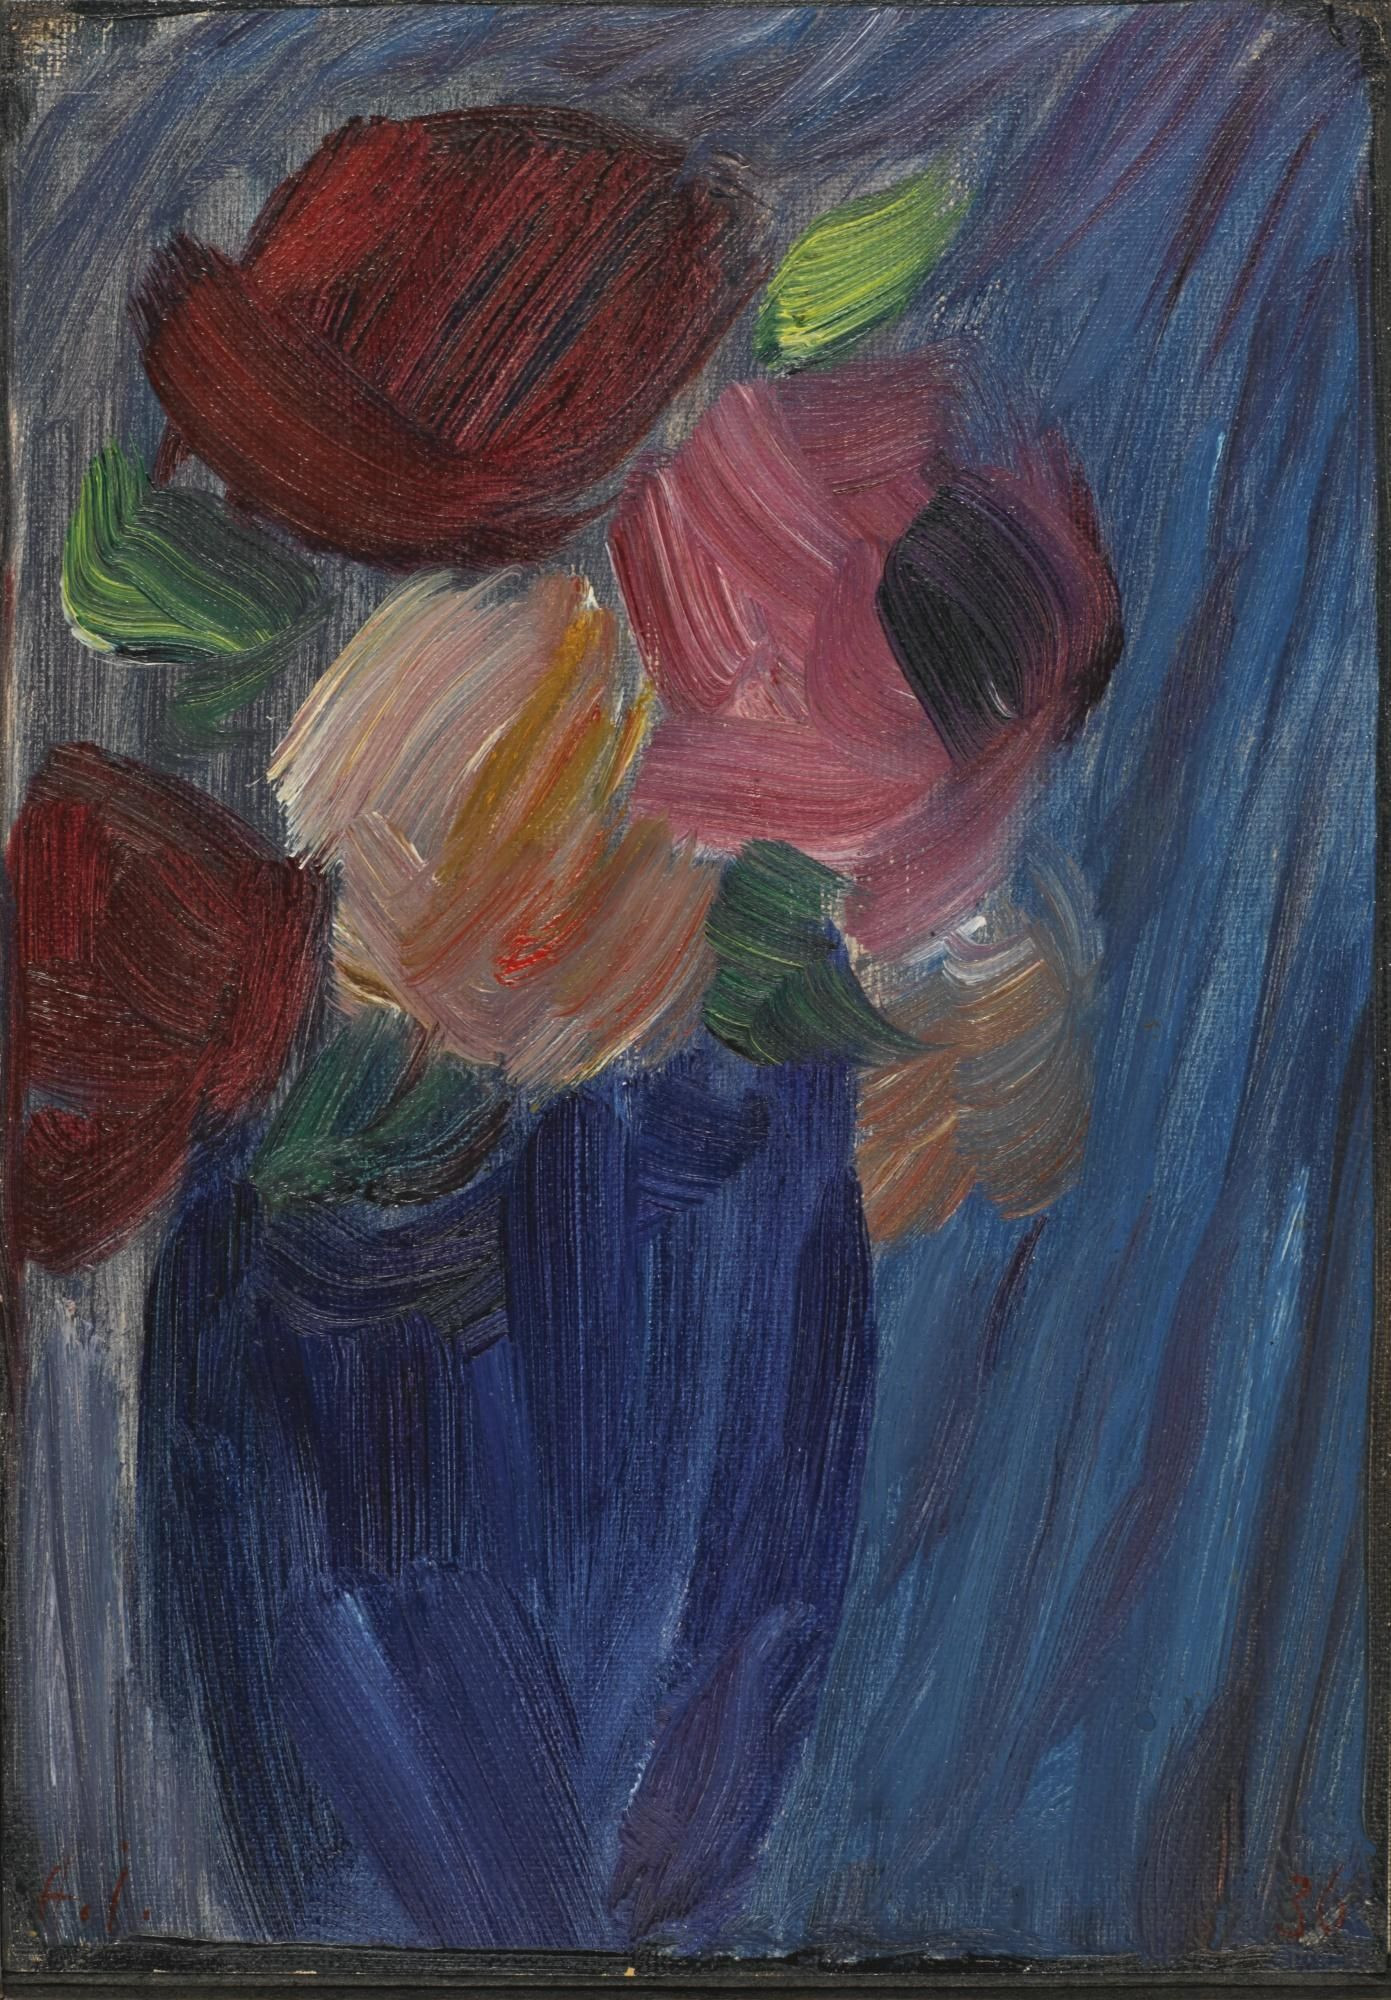 blue vase flowers painting of alexej von jawlensky 1864 1941 rosen in ultramarinblauer vase pertaining to alexej von jawlensky 1864 1941 rosen in ultramarinblauer vase 1936 25 x 175 cm